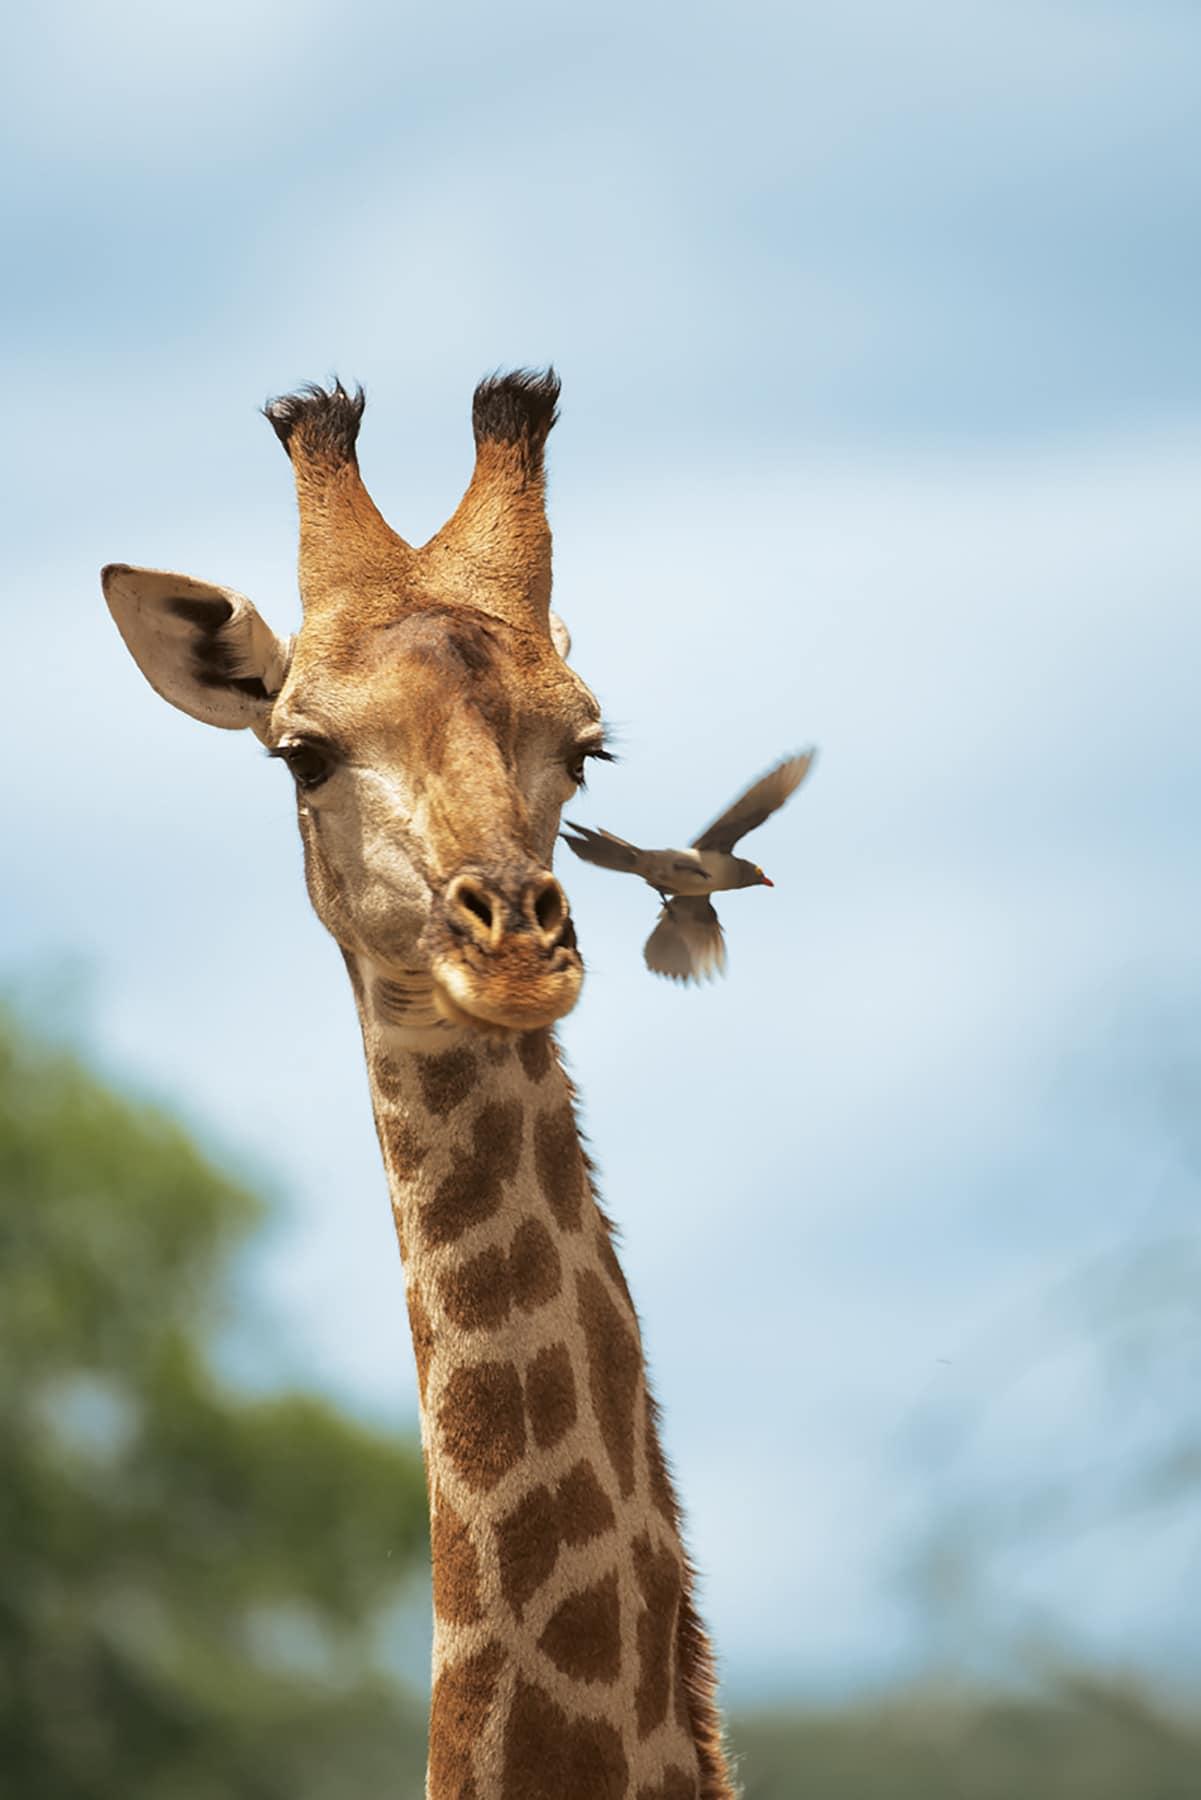 https://www.safariventures.com/wp-content/uploads/2019/01/F0J0871-Edit.jpg